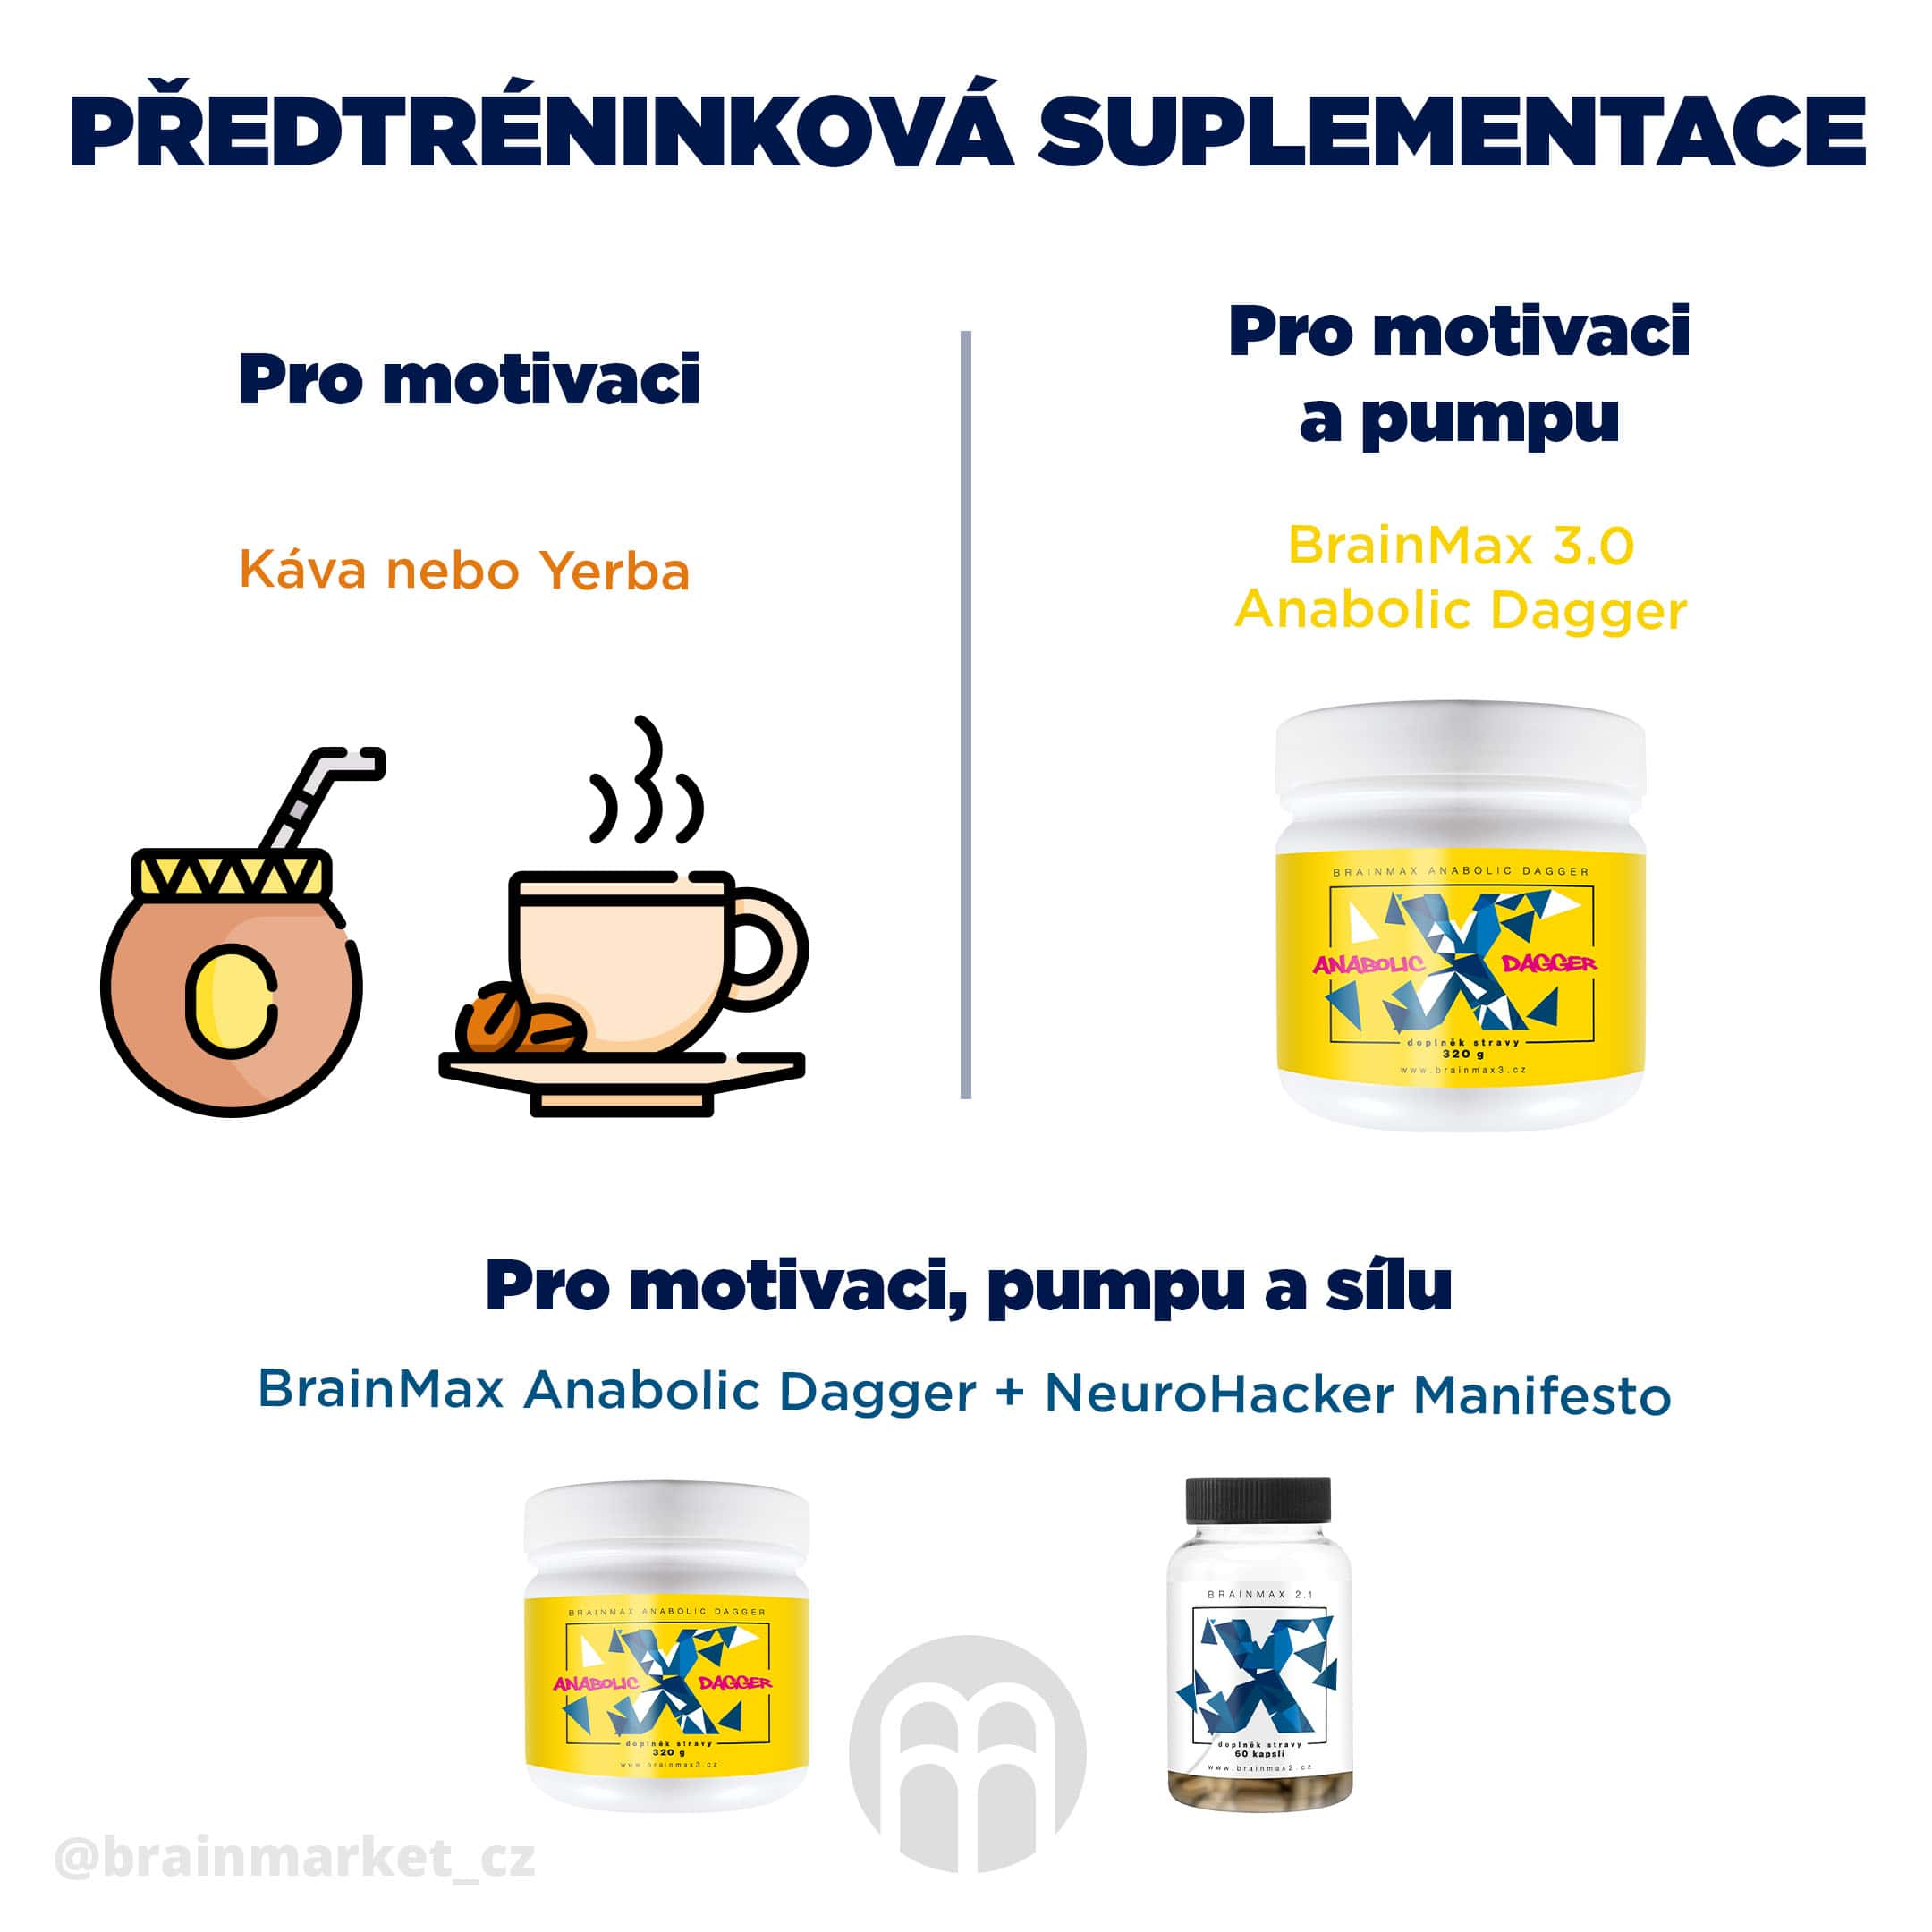 predtreninkova_suplementace_Infografika_Instagram_BrainMarket-min